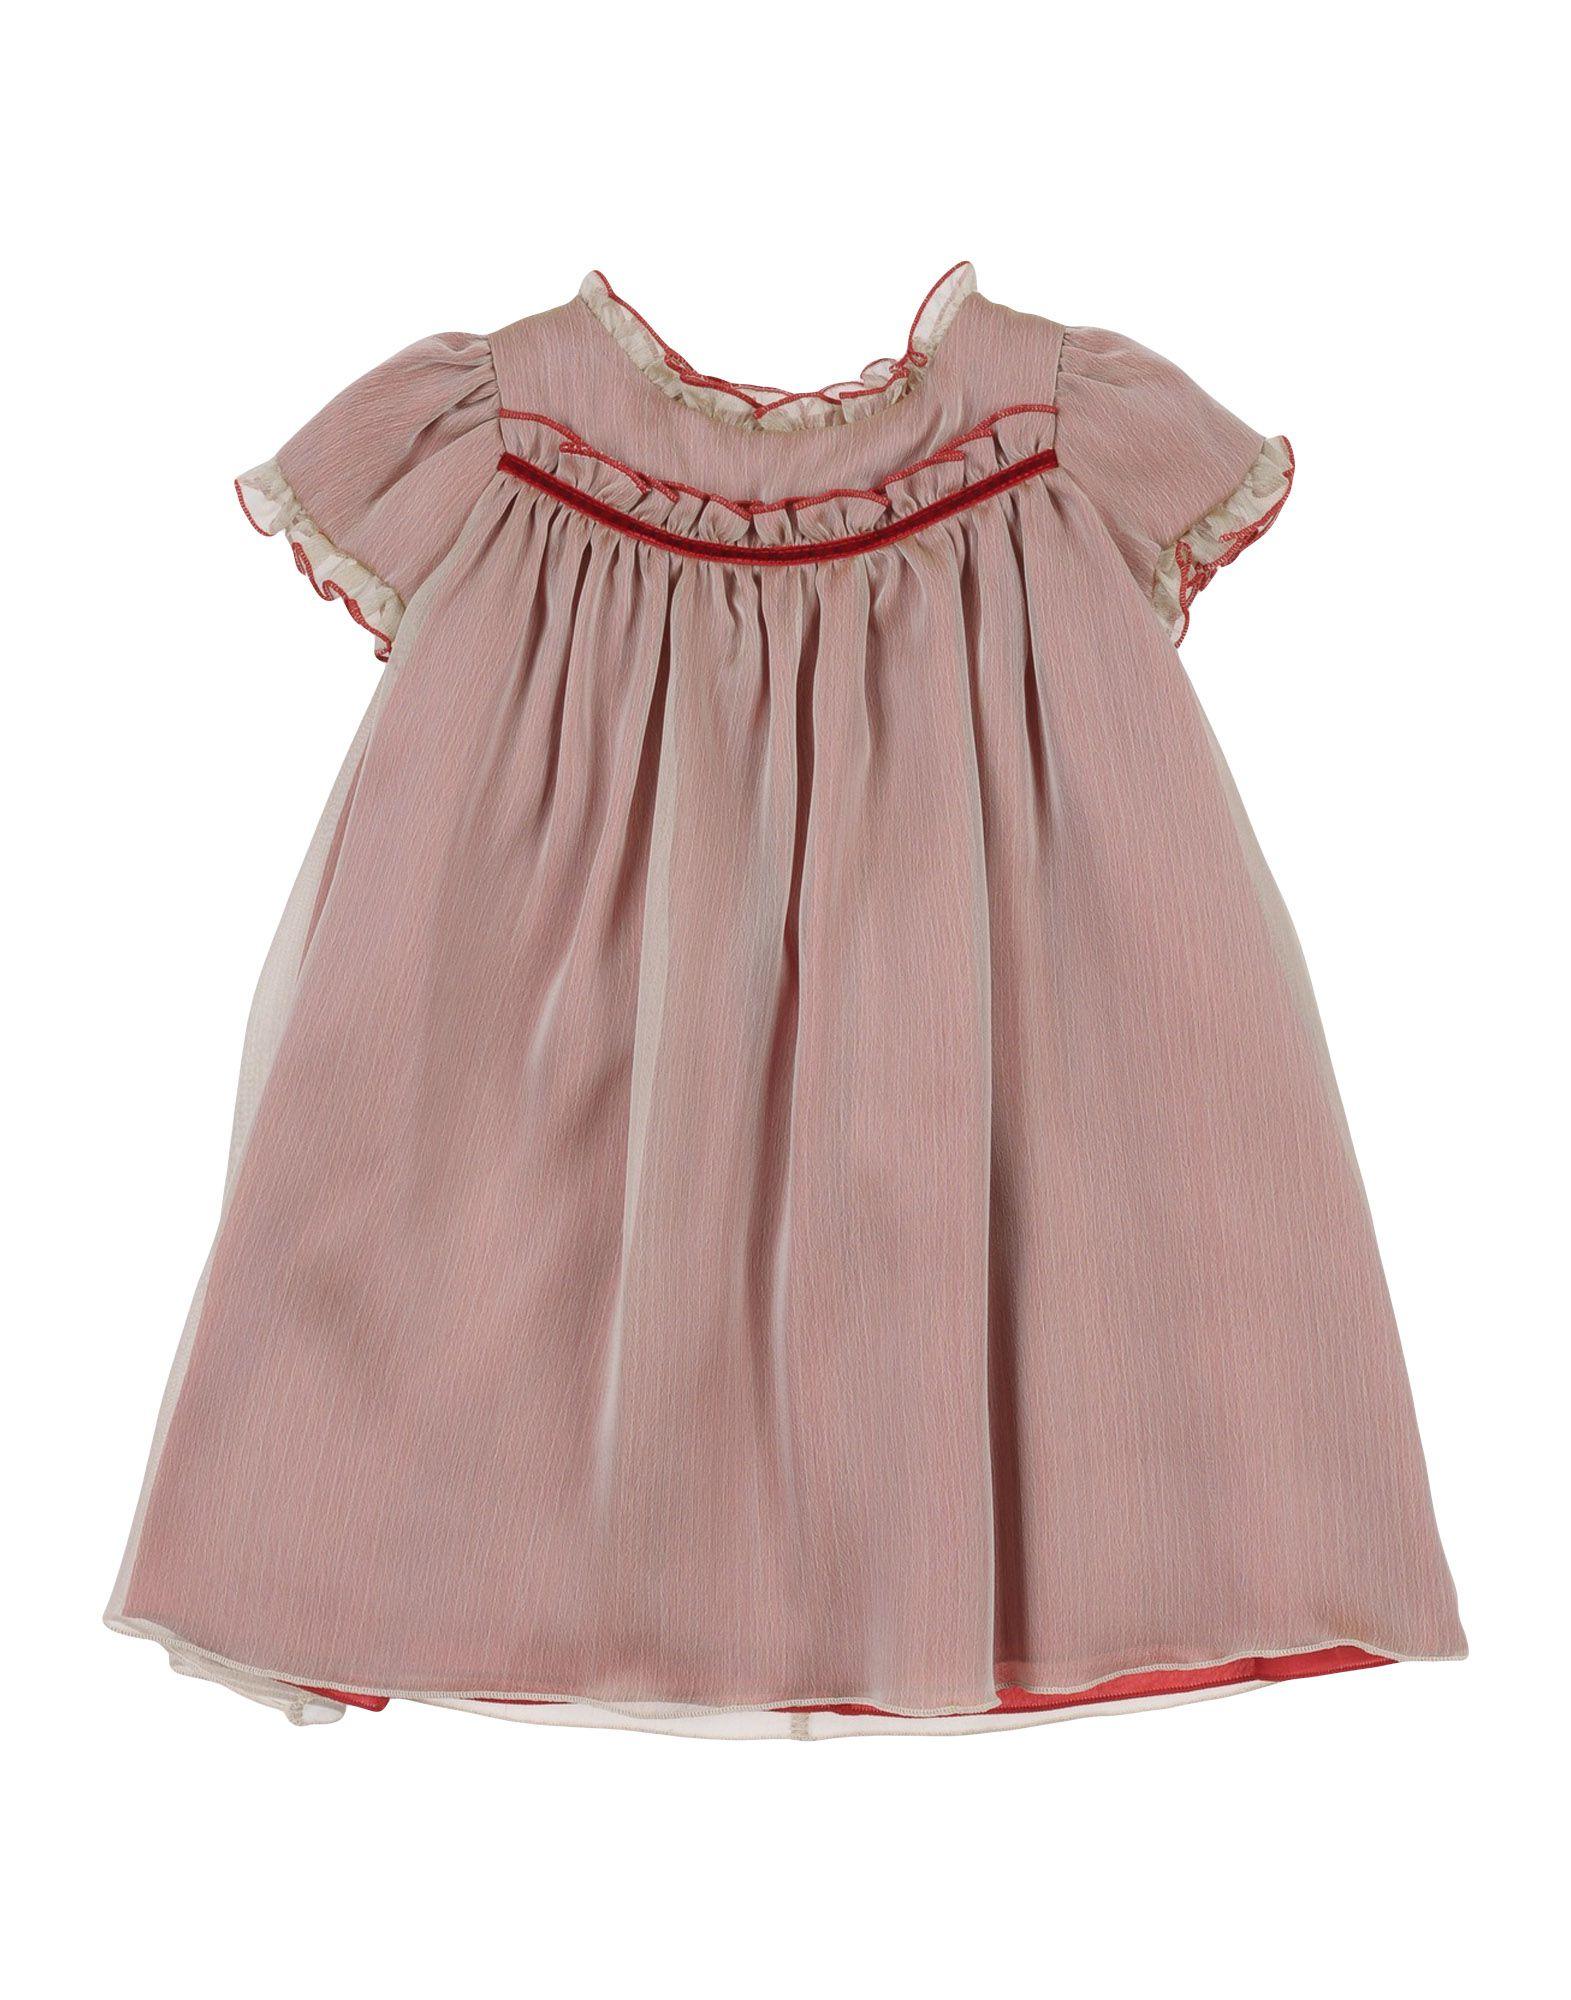 LA STUPENDERIA Dress in Pastel Pink